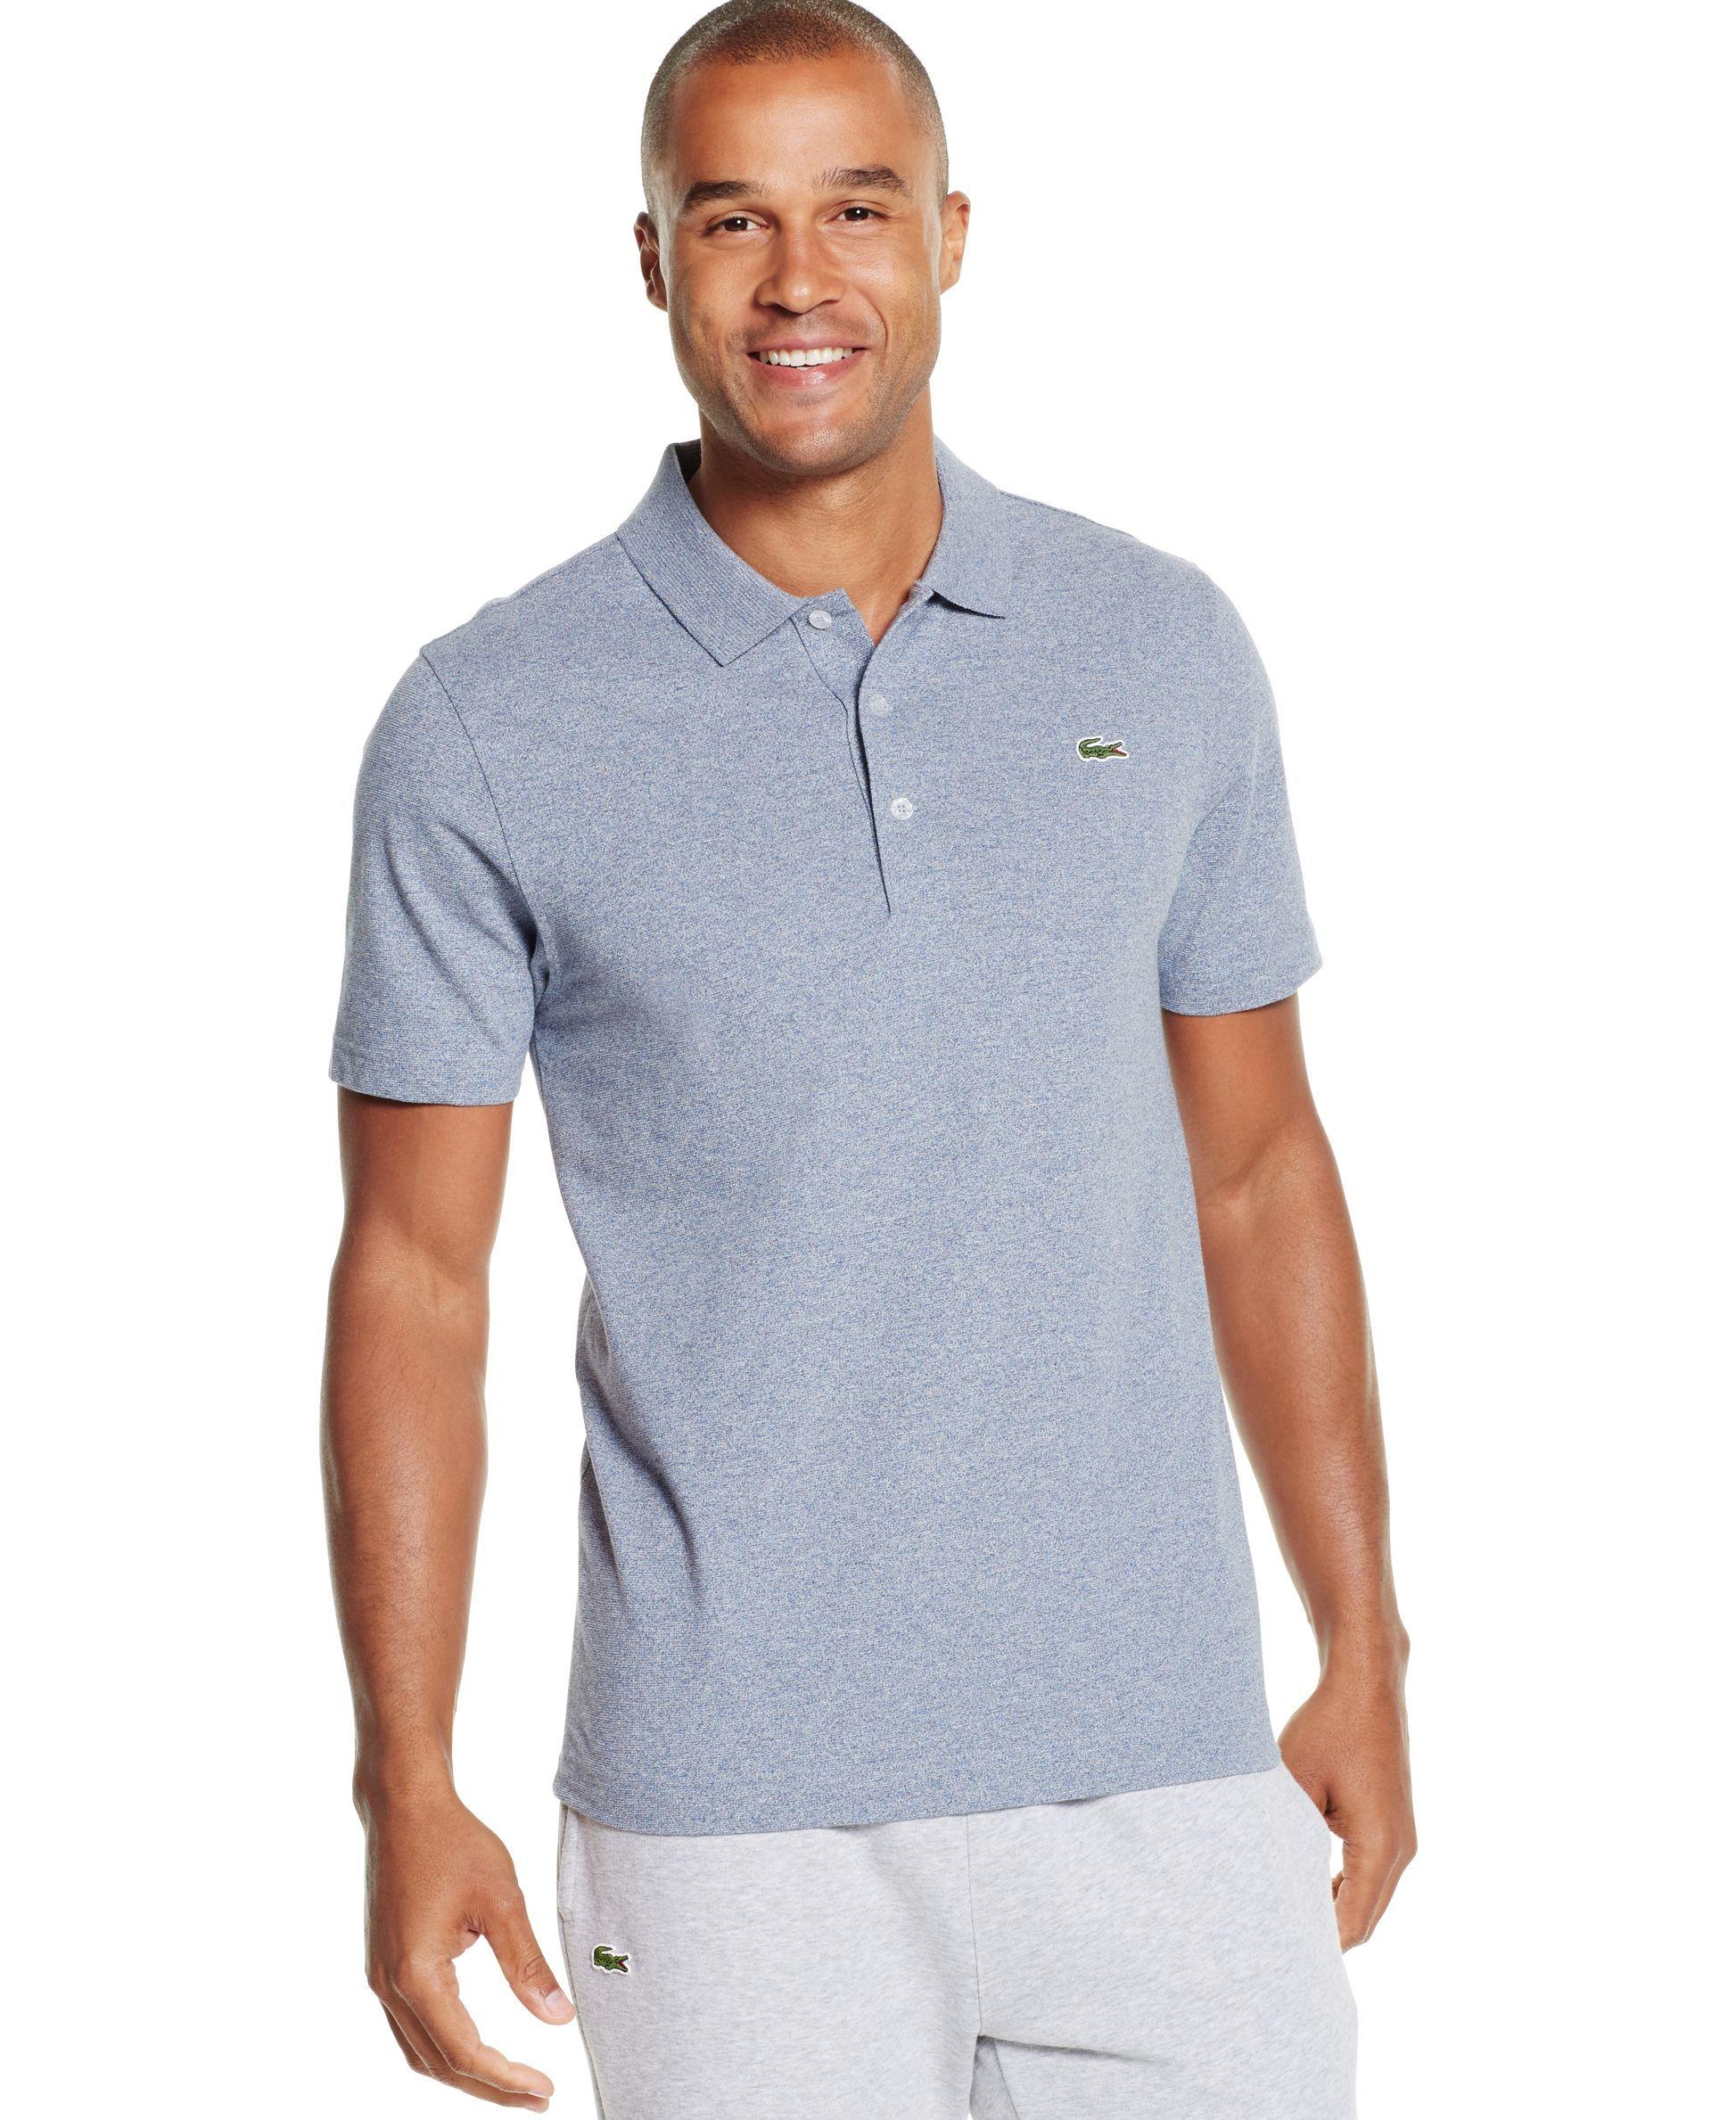 be25e66a87a Lacoste Sport Pocket Polo T Shirt Blue